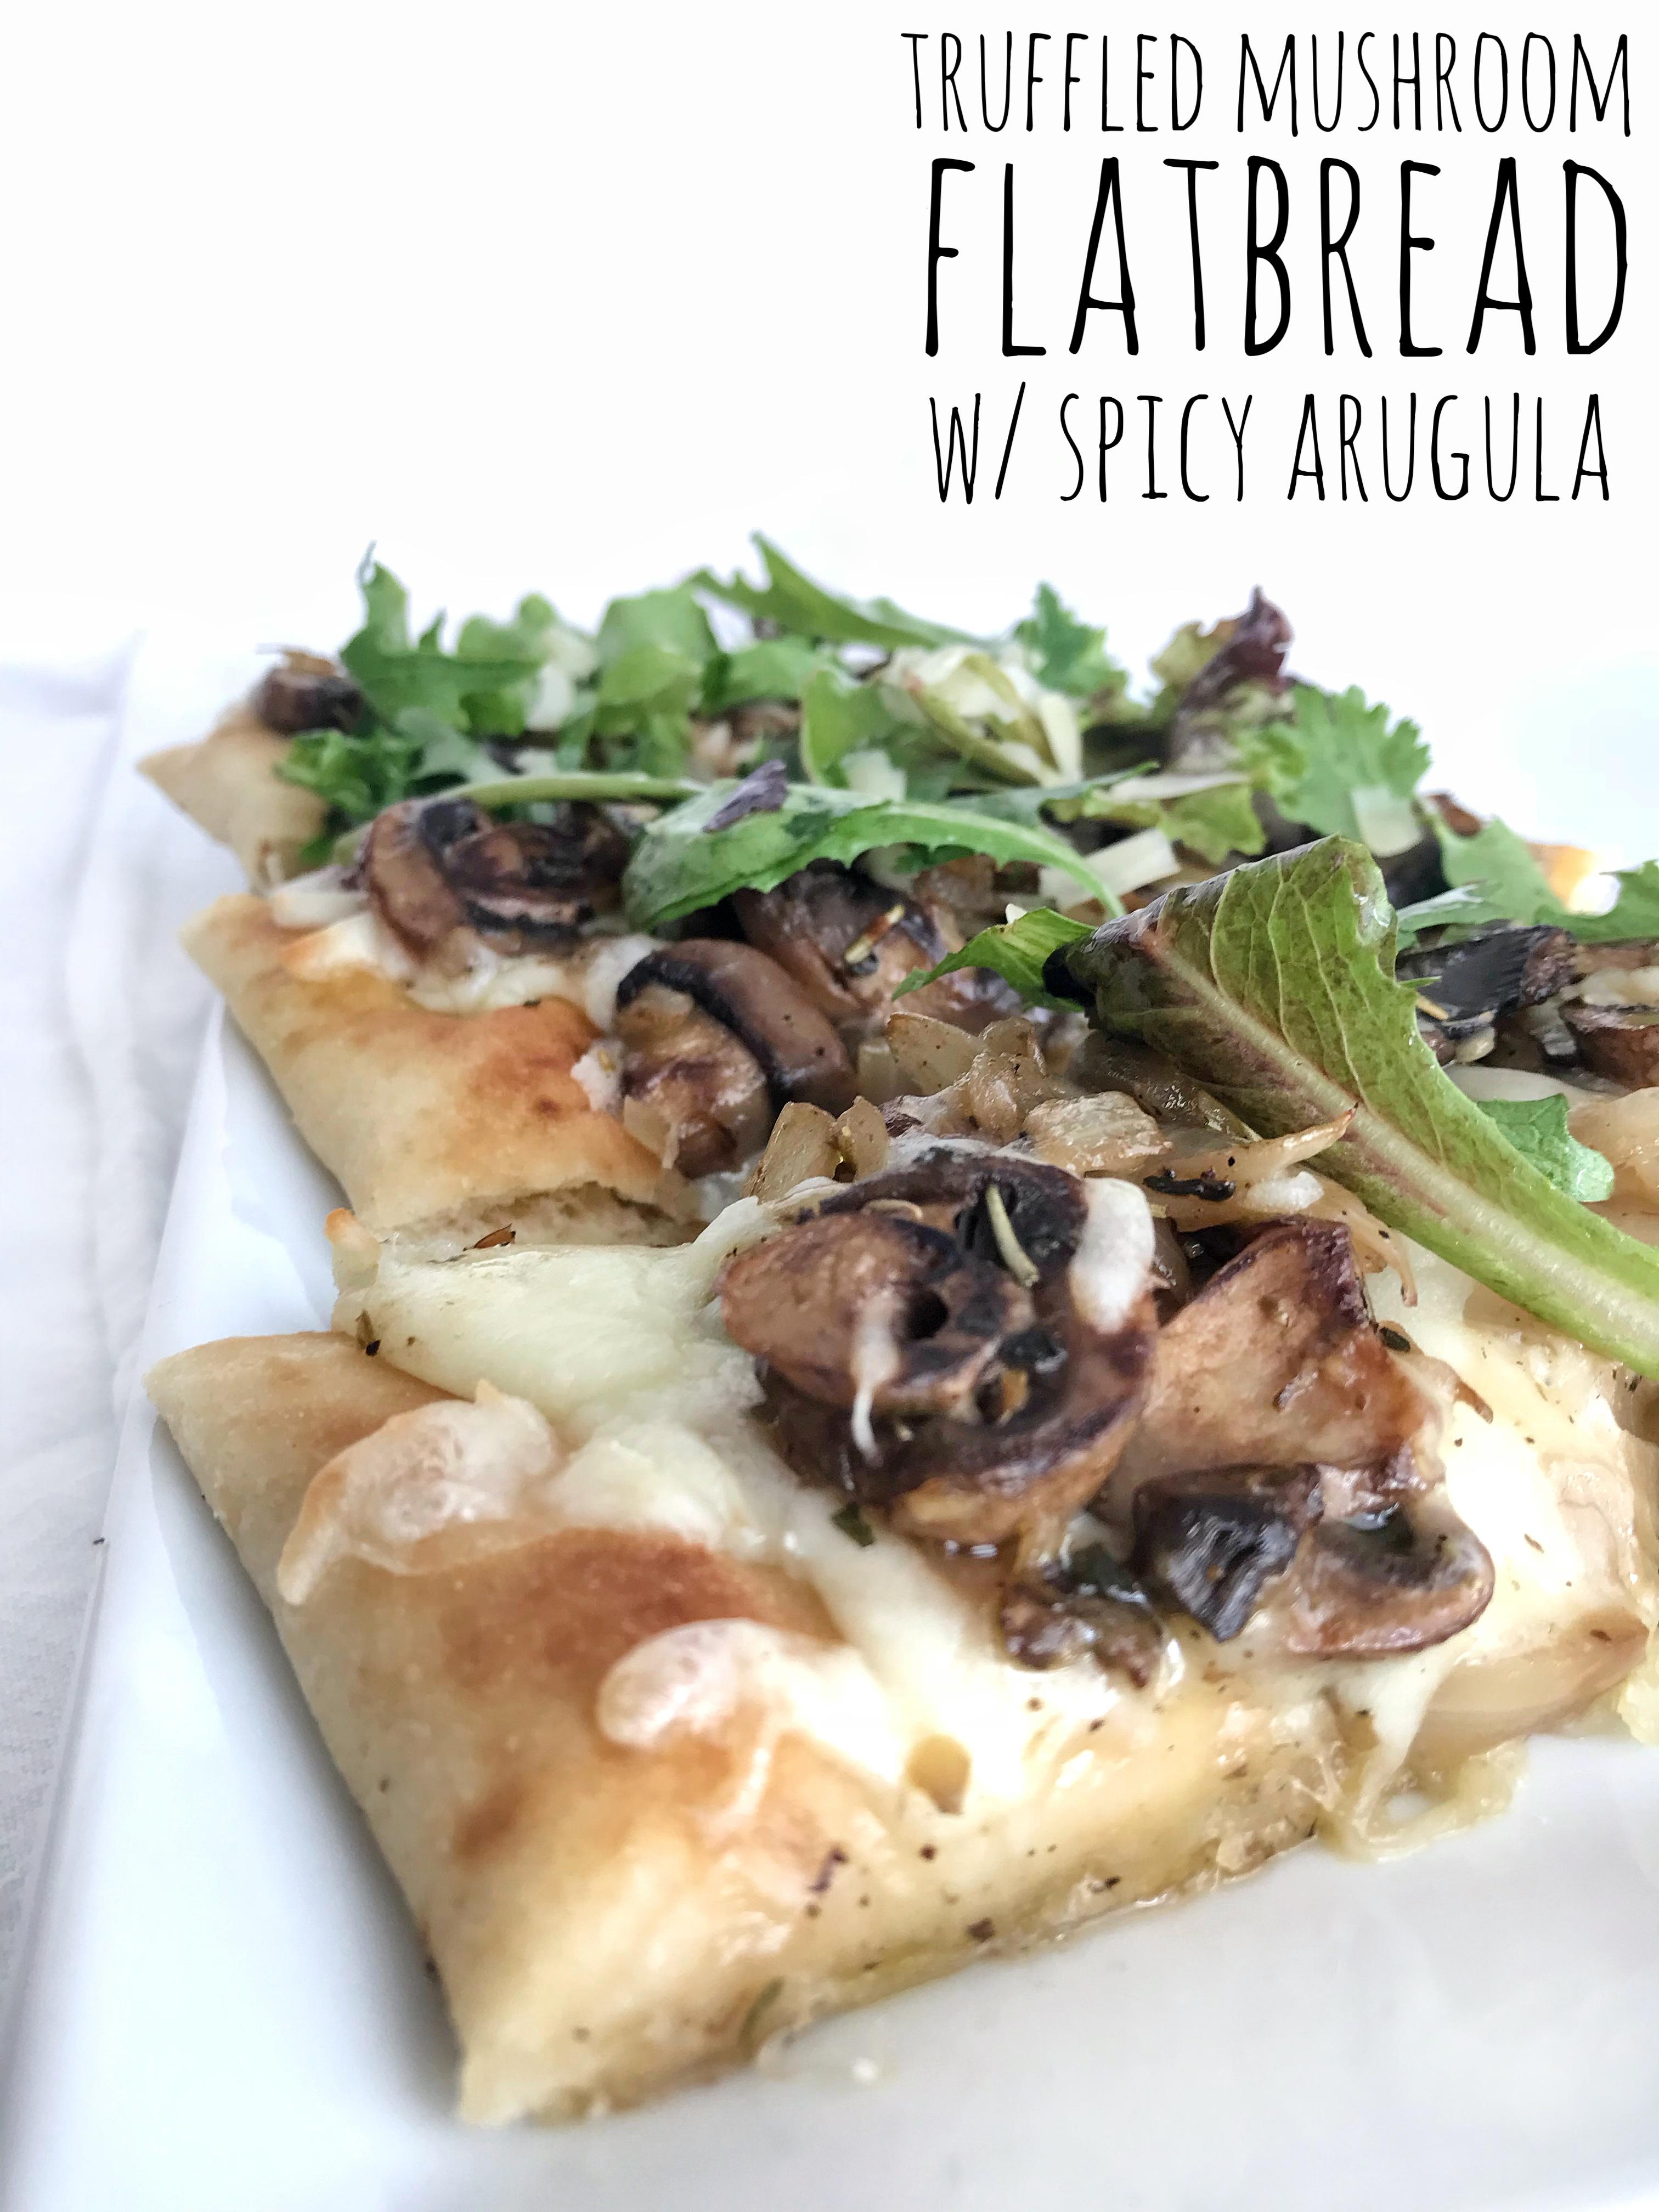 Try our Truffled Mushroom Flatbread Recipe